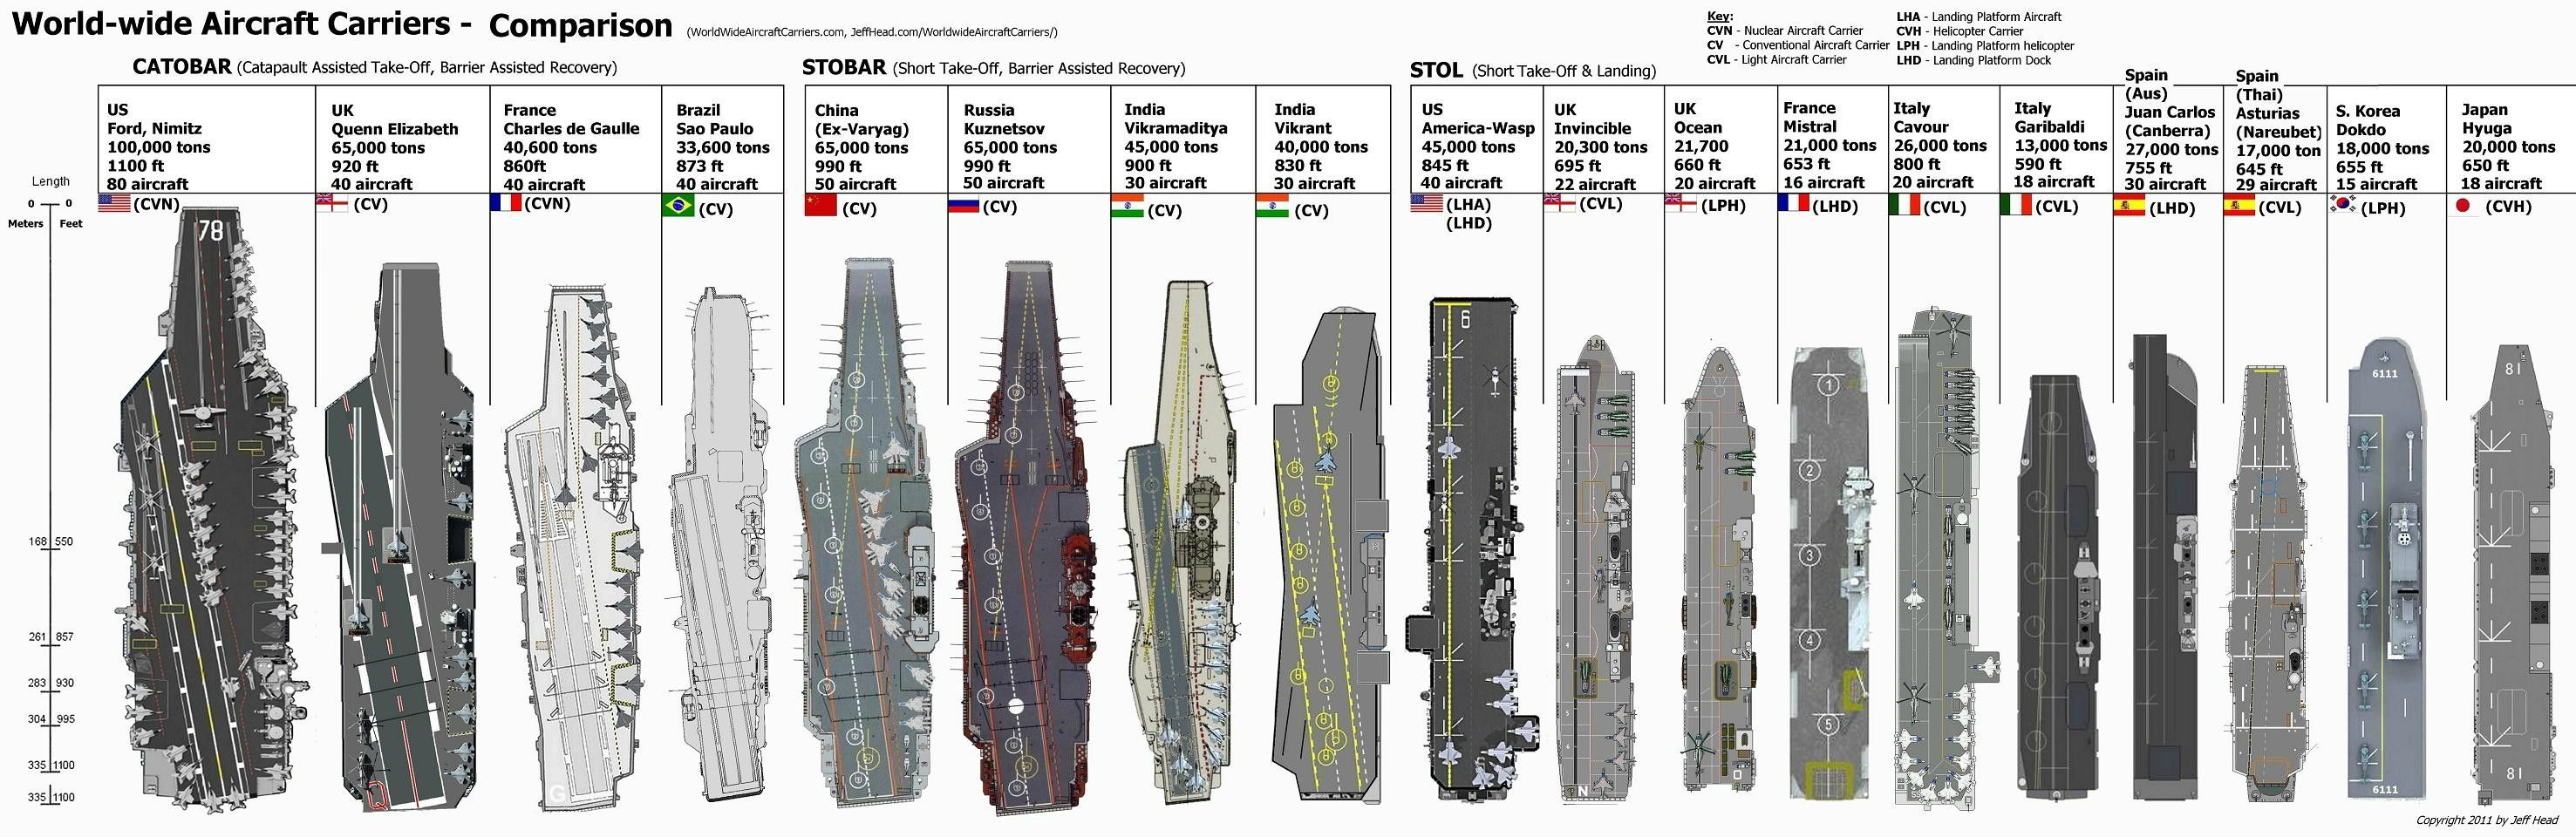 Uss Nimitz Size Comparison Modern aircraft...